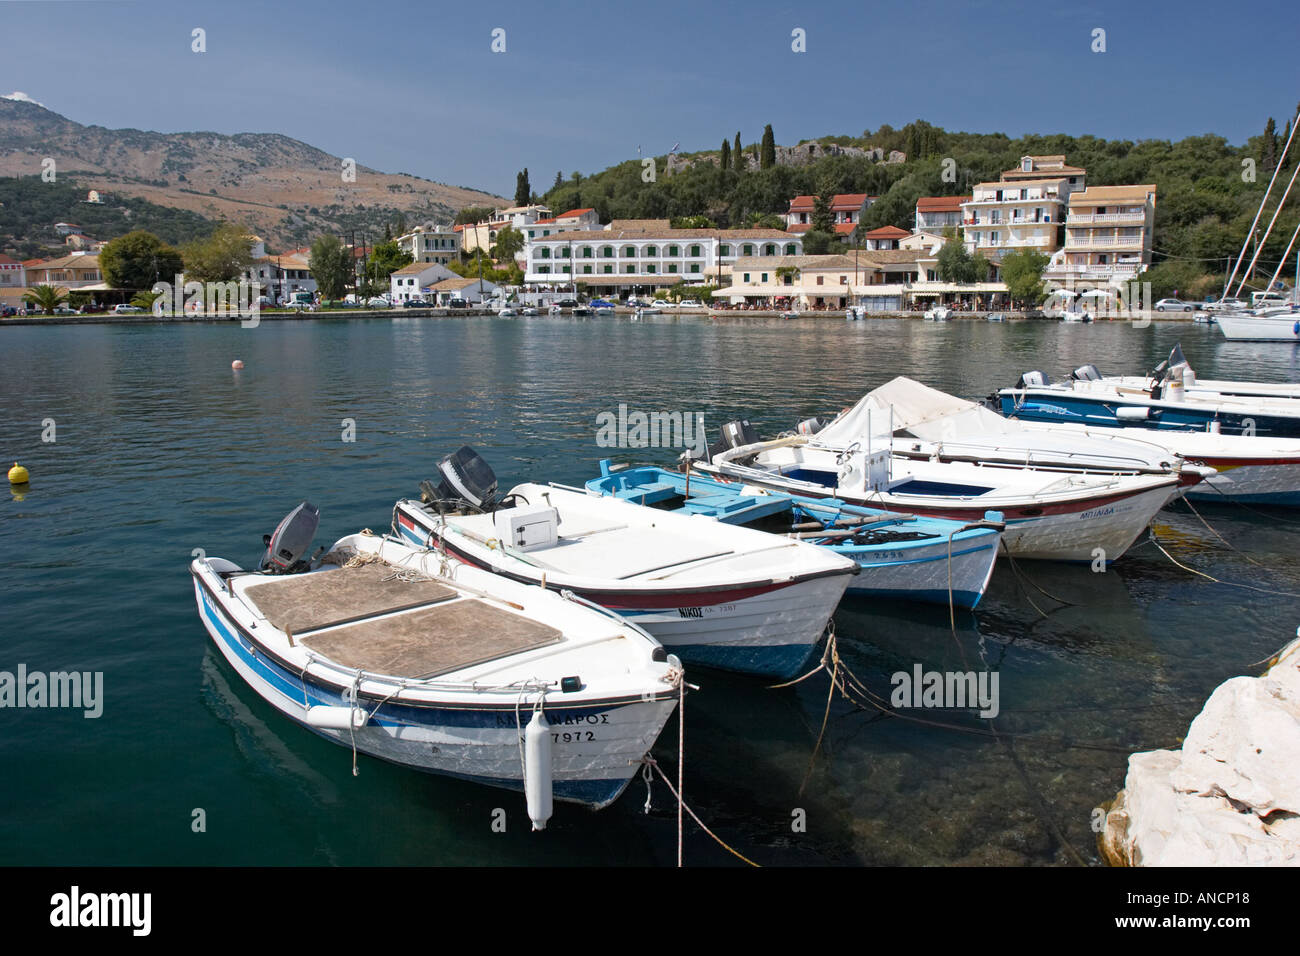 Kassiopi harbour. Corfu island, Greece. Stock Photo